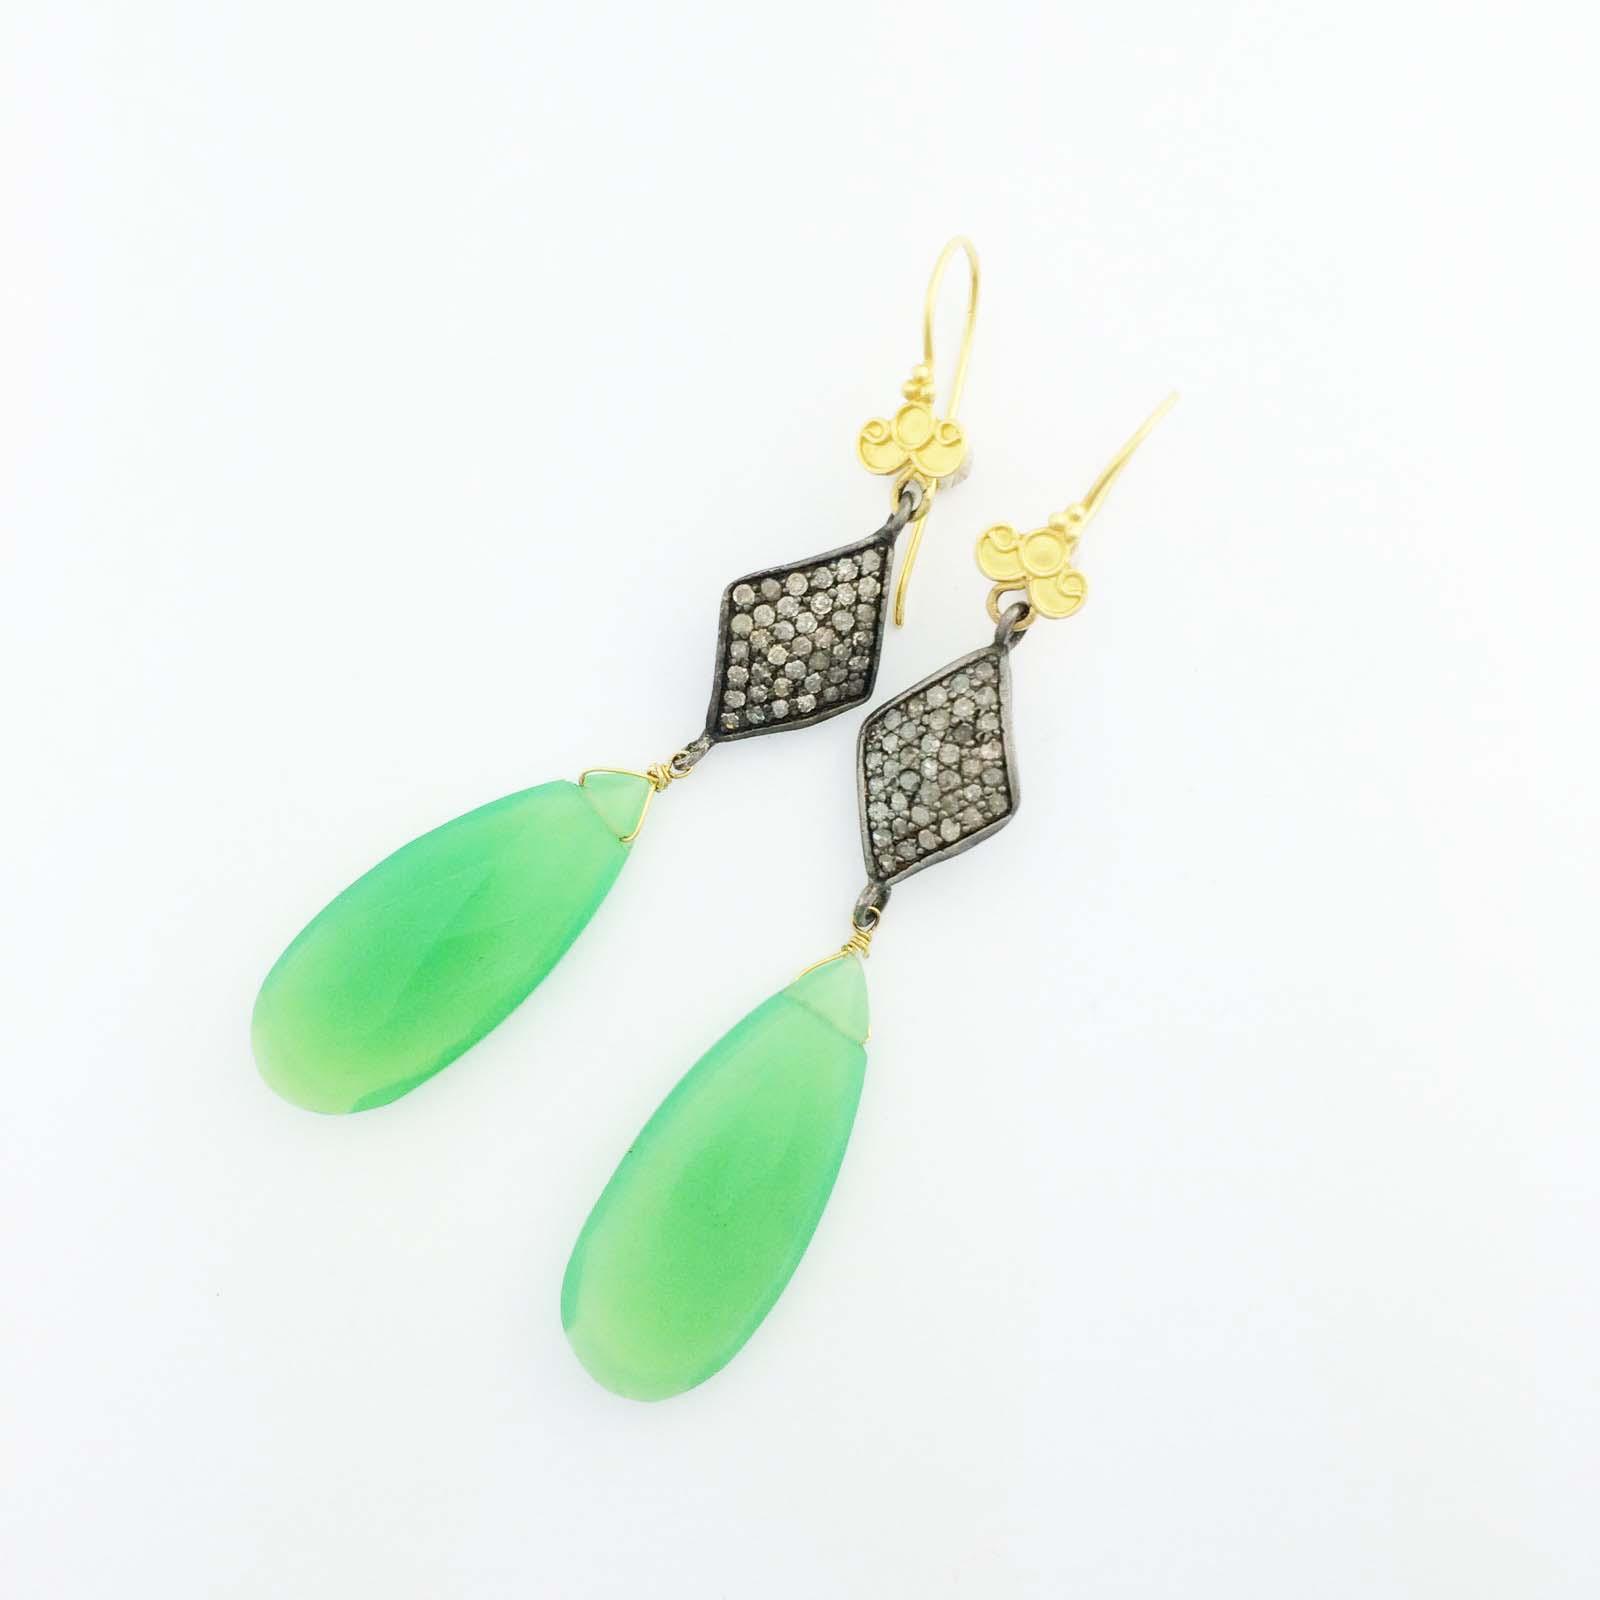 Chryocal and diamond drop earrings